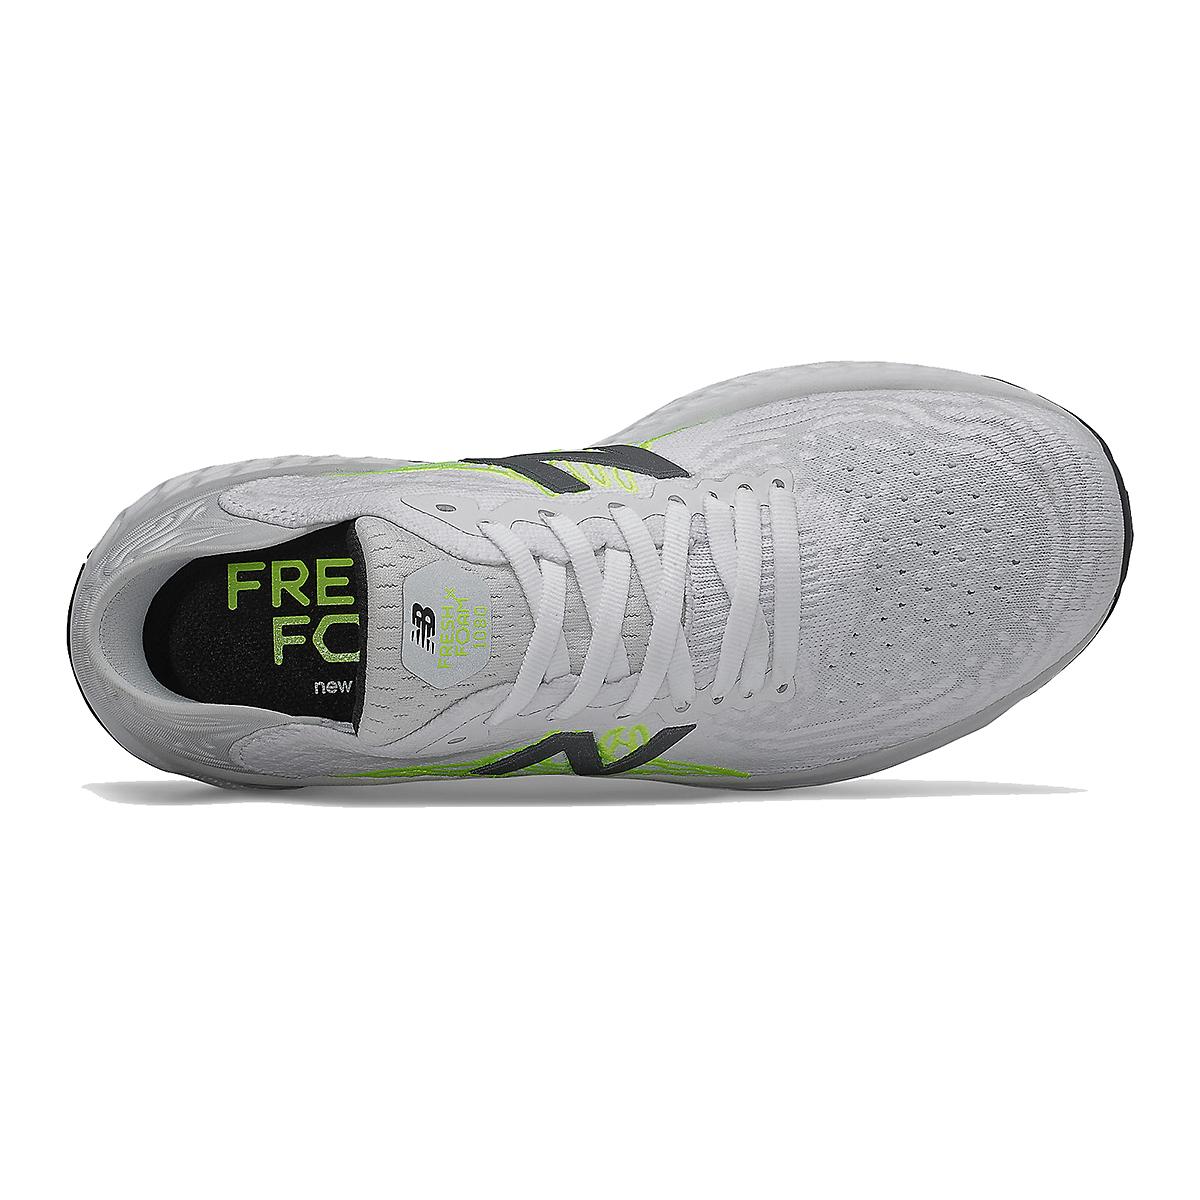 Women's New Balance Fresh Foam 1080v10 Running Shoe - Color: Light Aluminum - Size: 5.5 - Width: Extra Wide, Light Aluminum, large, image 4